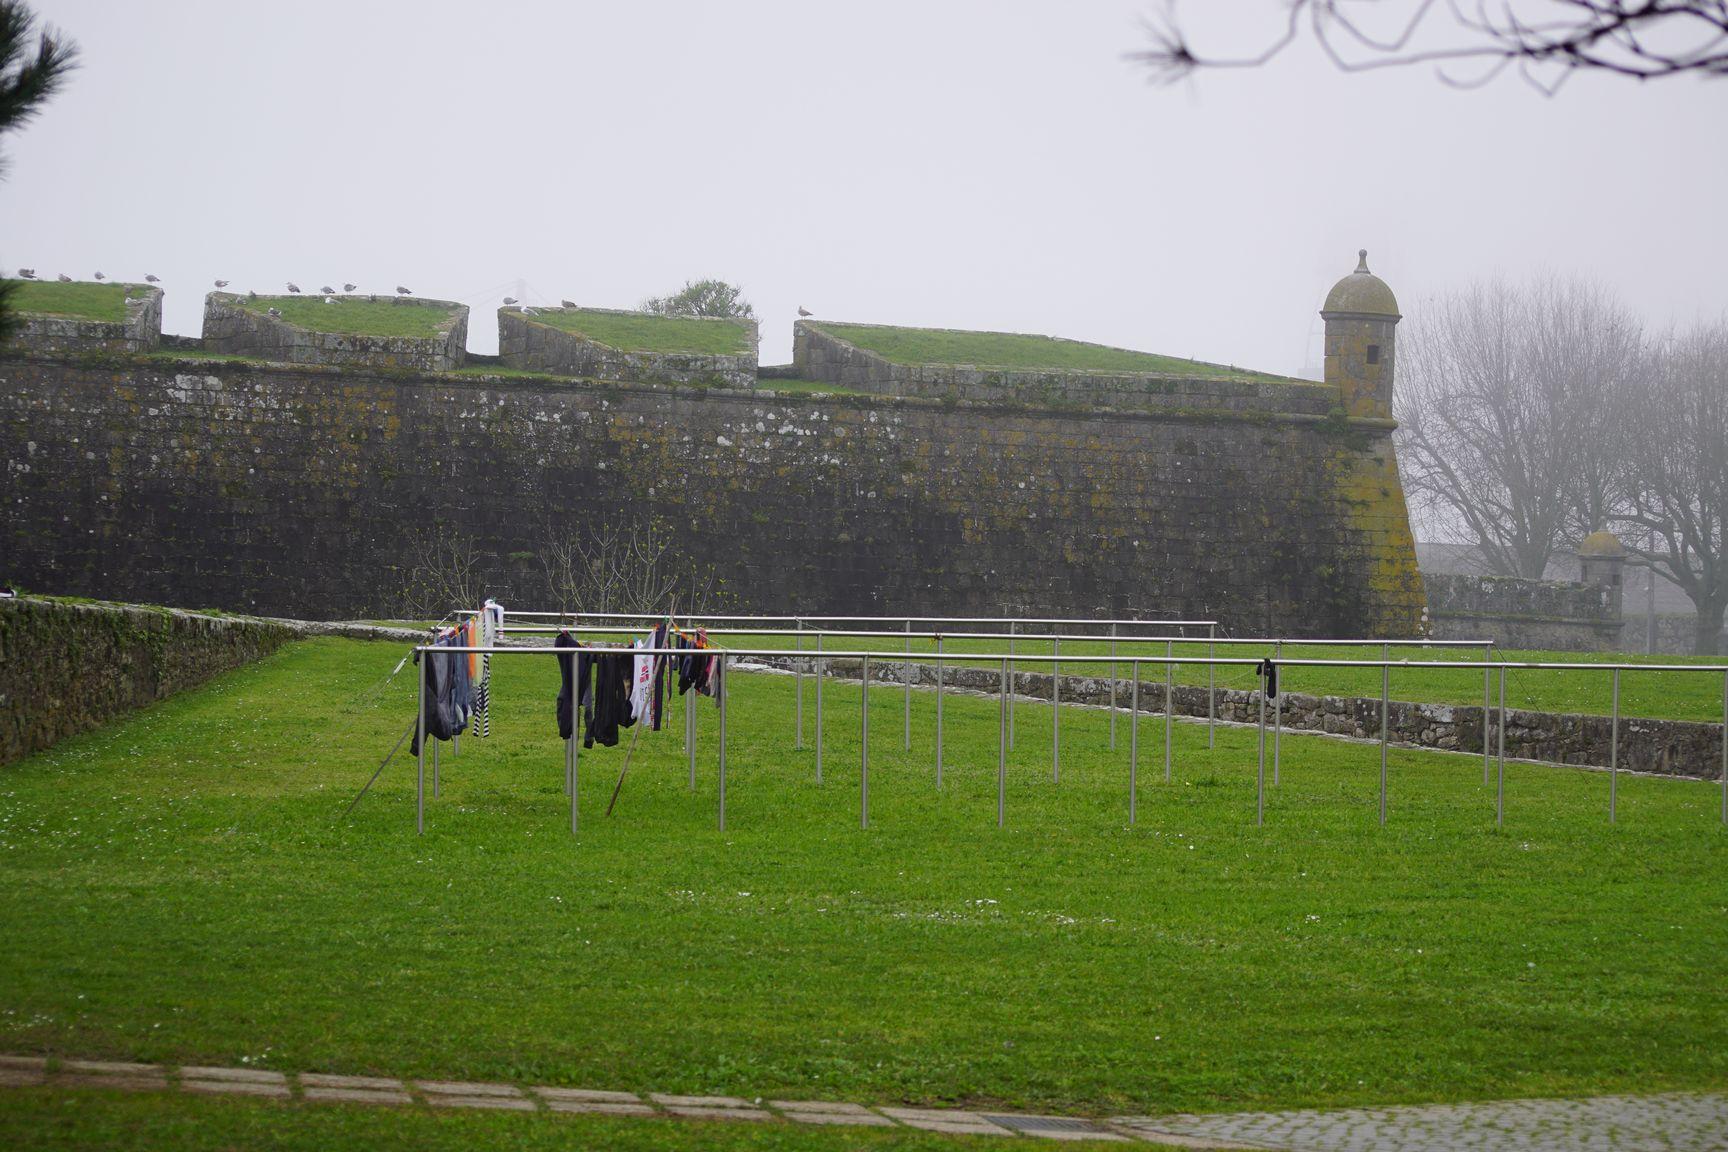 Viana do castelo mars 2020 (19)